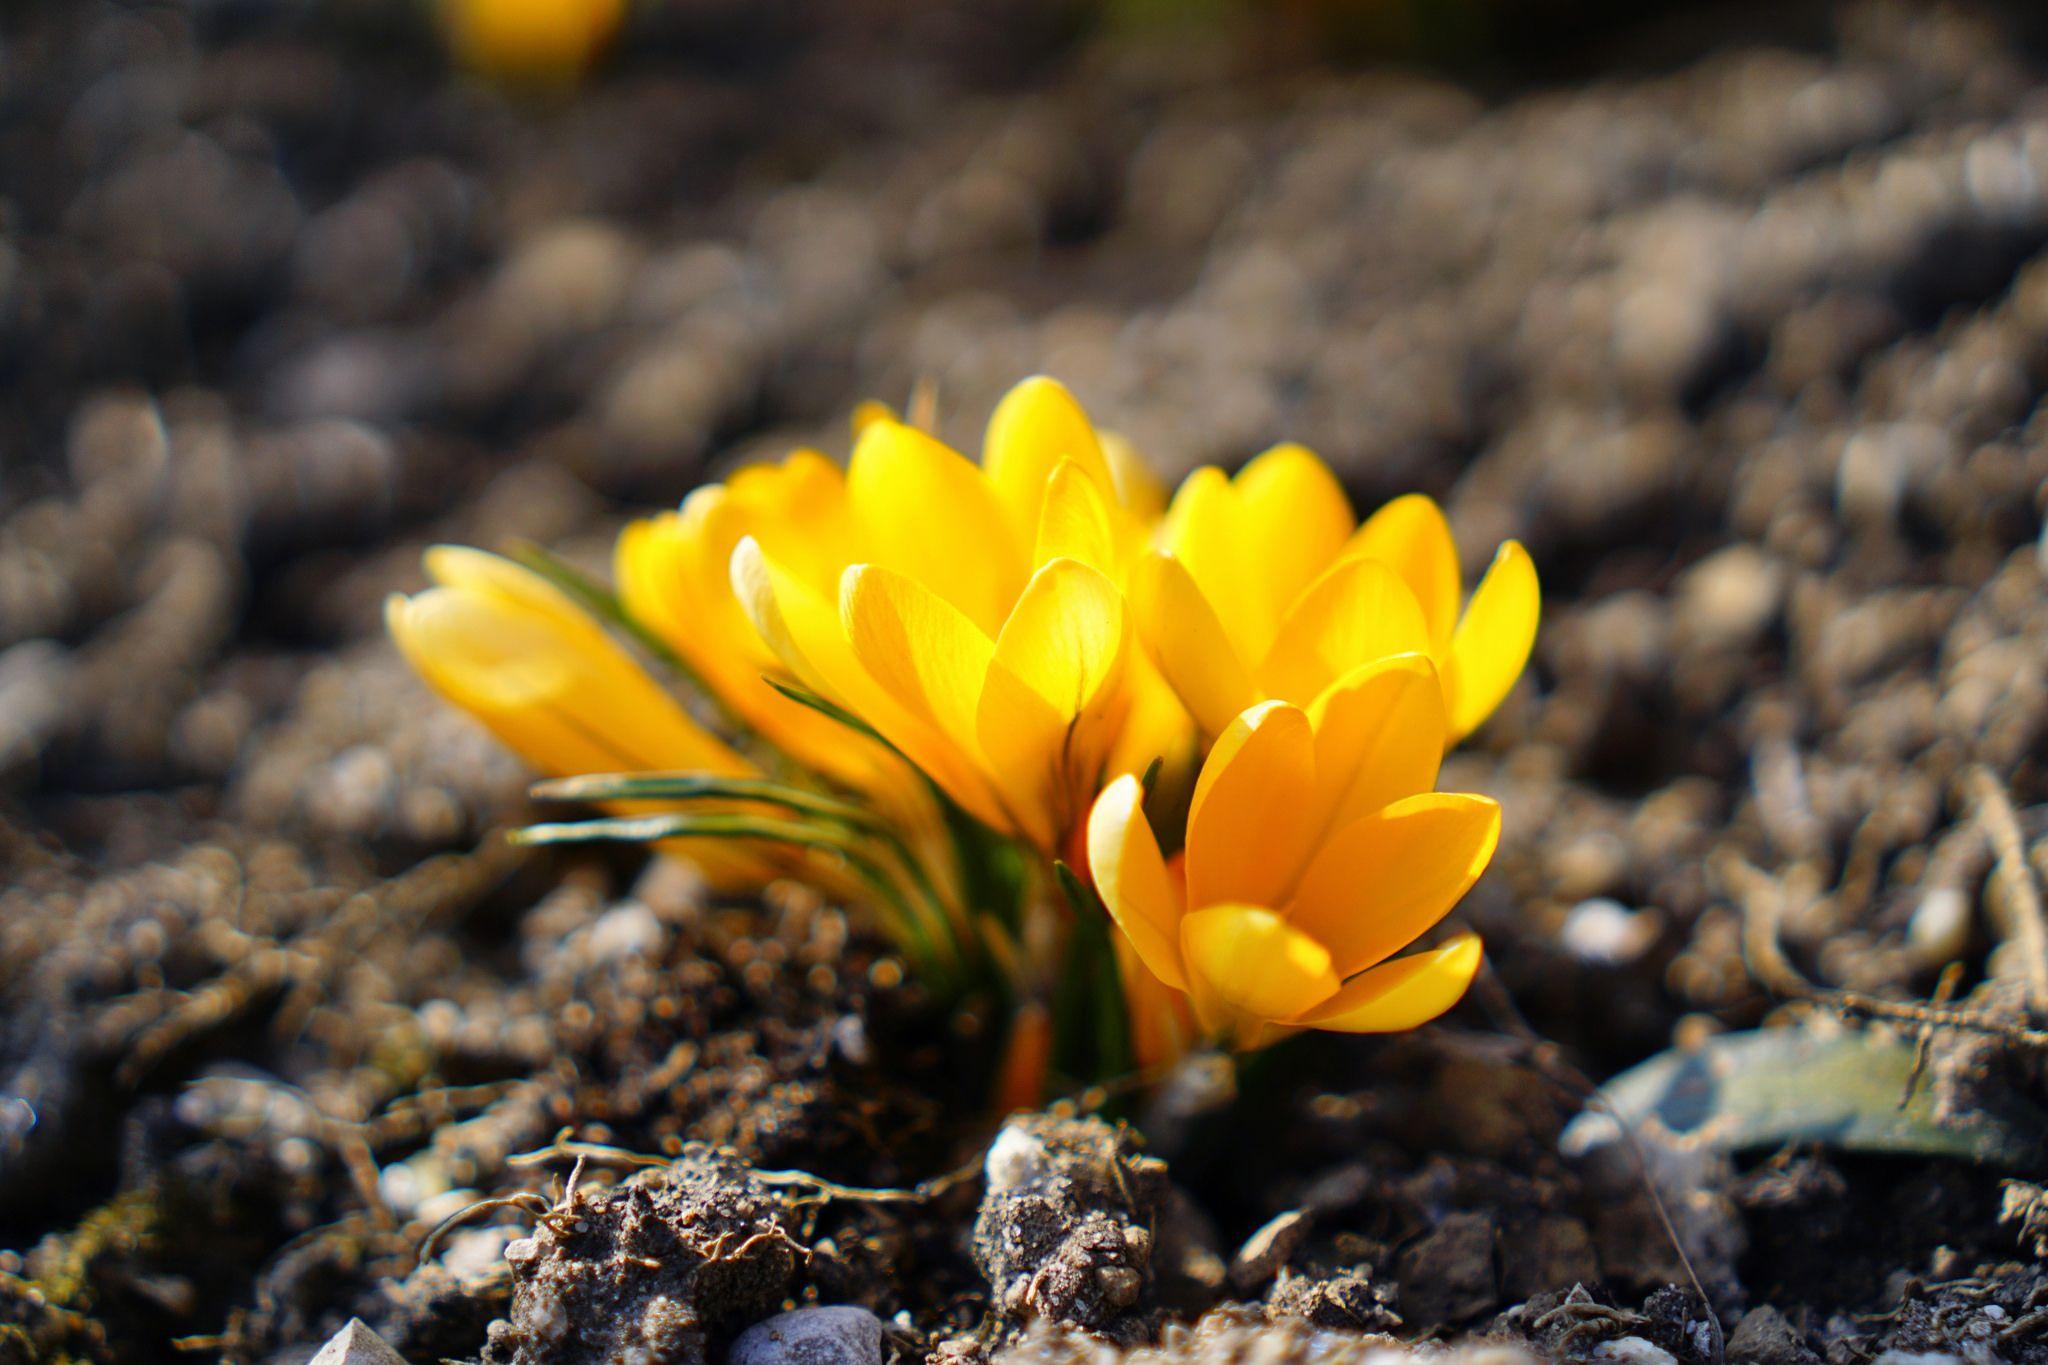 Flowers embellish the weekend | Flickr - Photo Sharing!